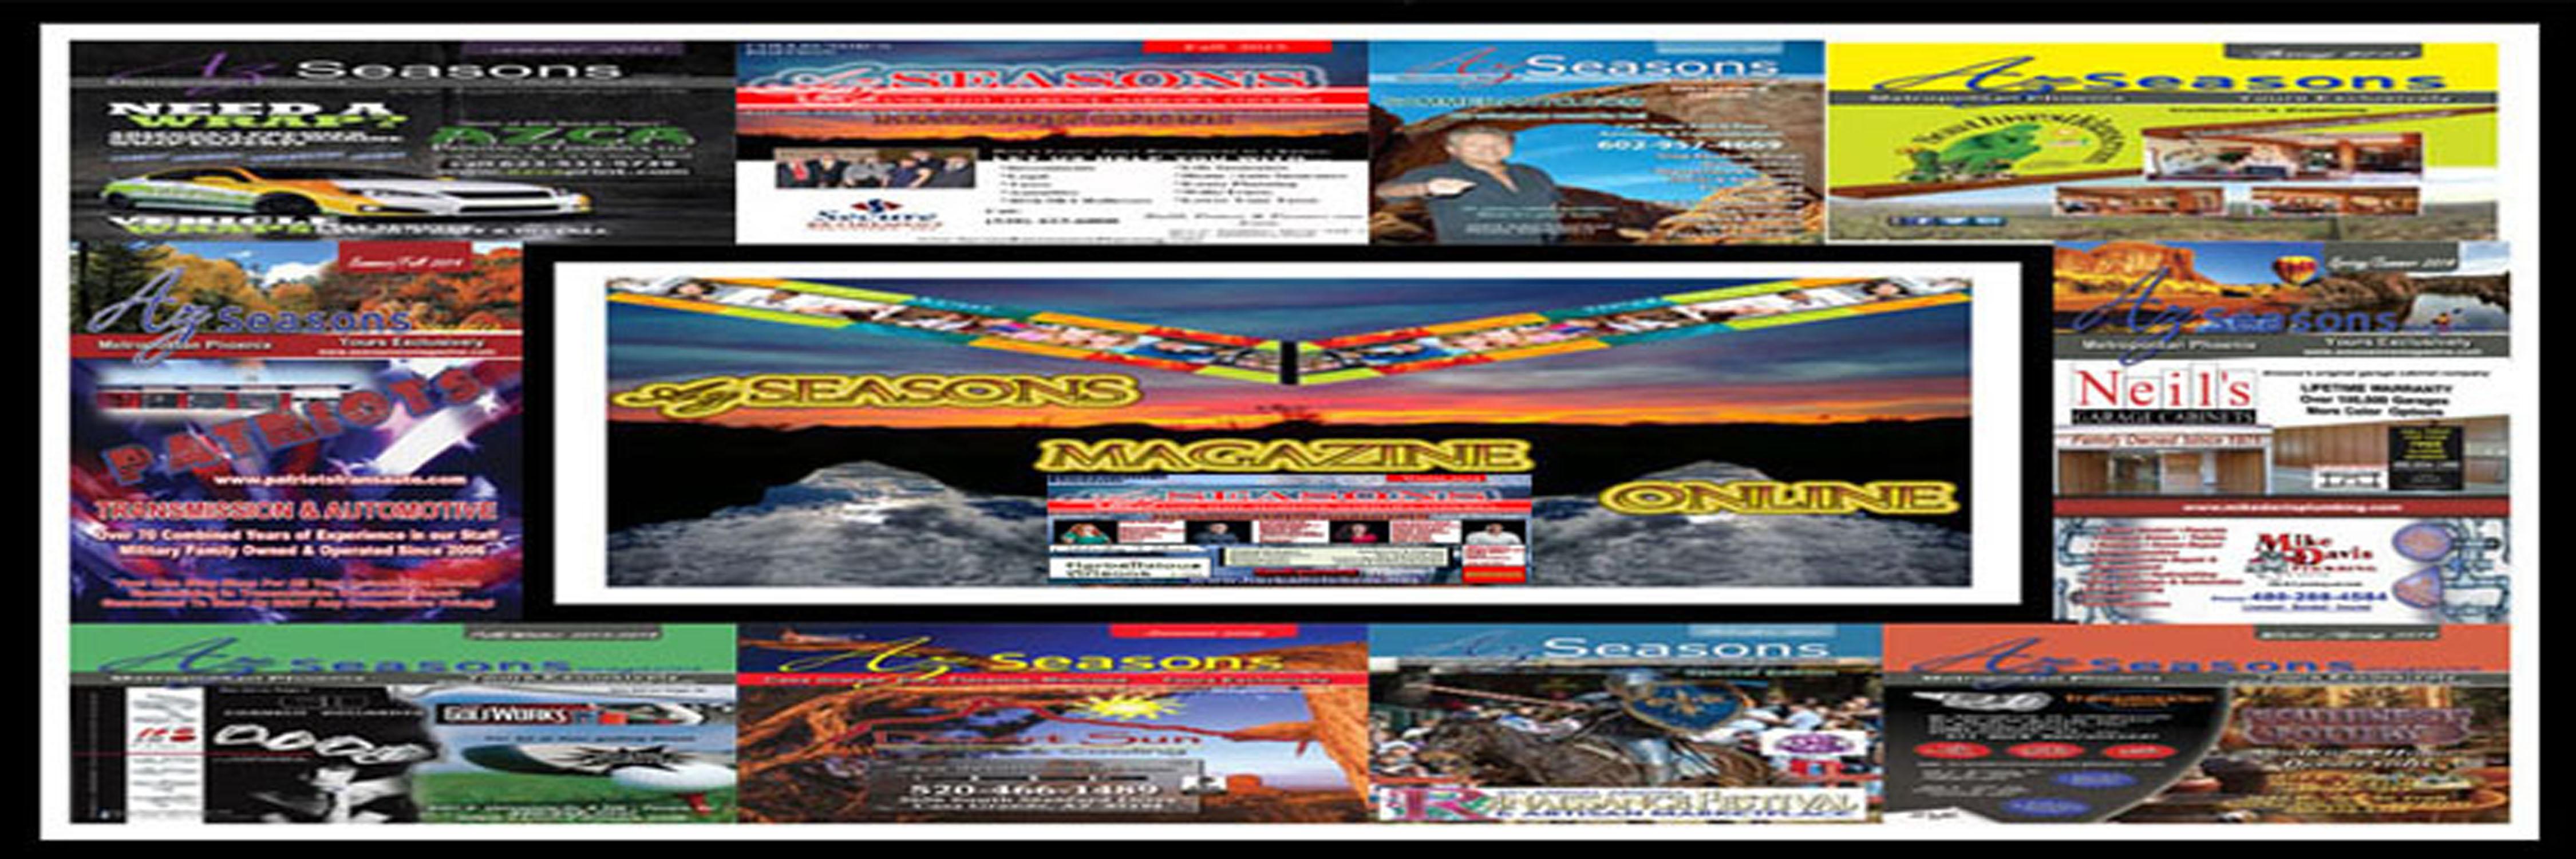 AZ SEASONS MAGAZINES ONLINE ARIZONA ONLINE MAGAZINES PUBLISH, POST